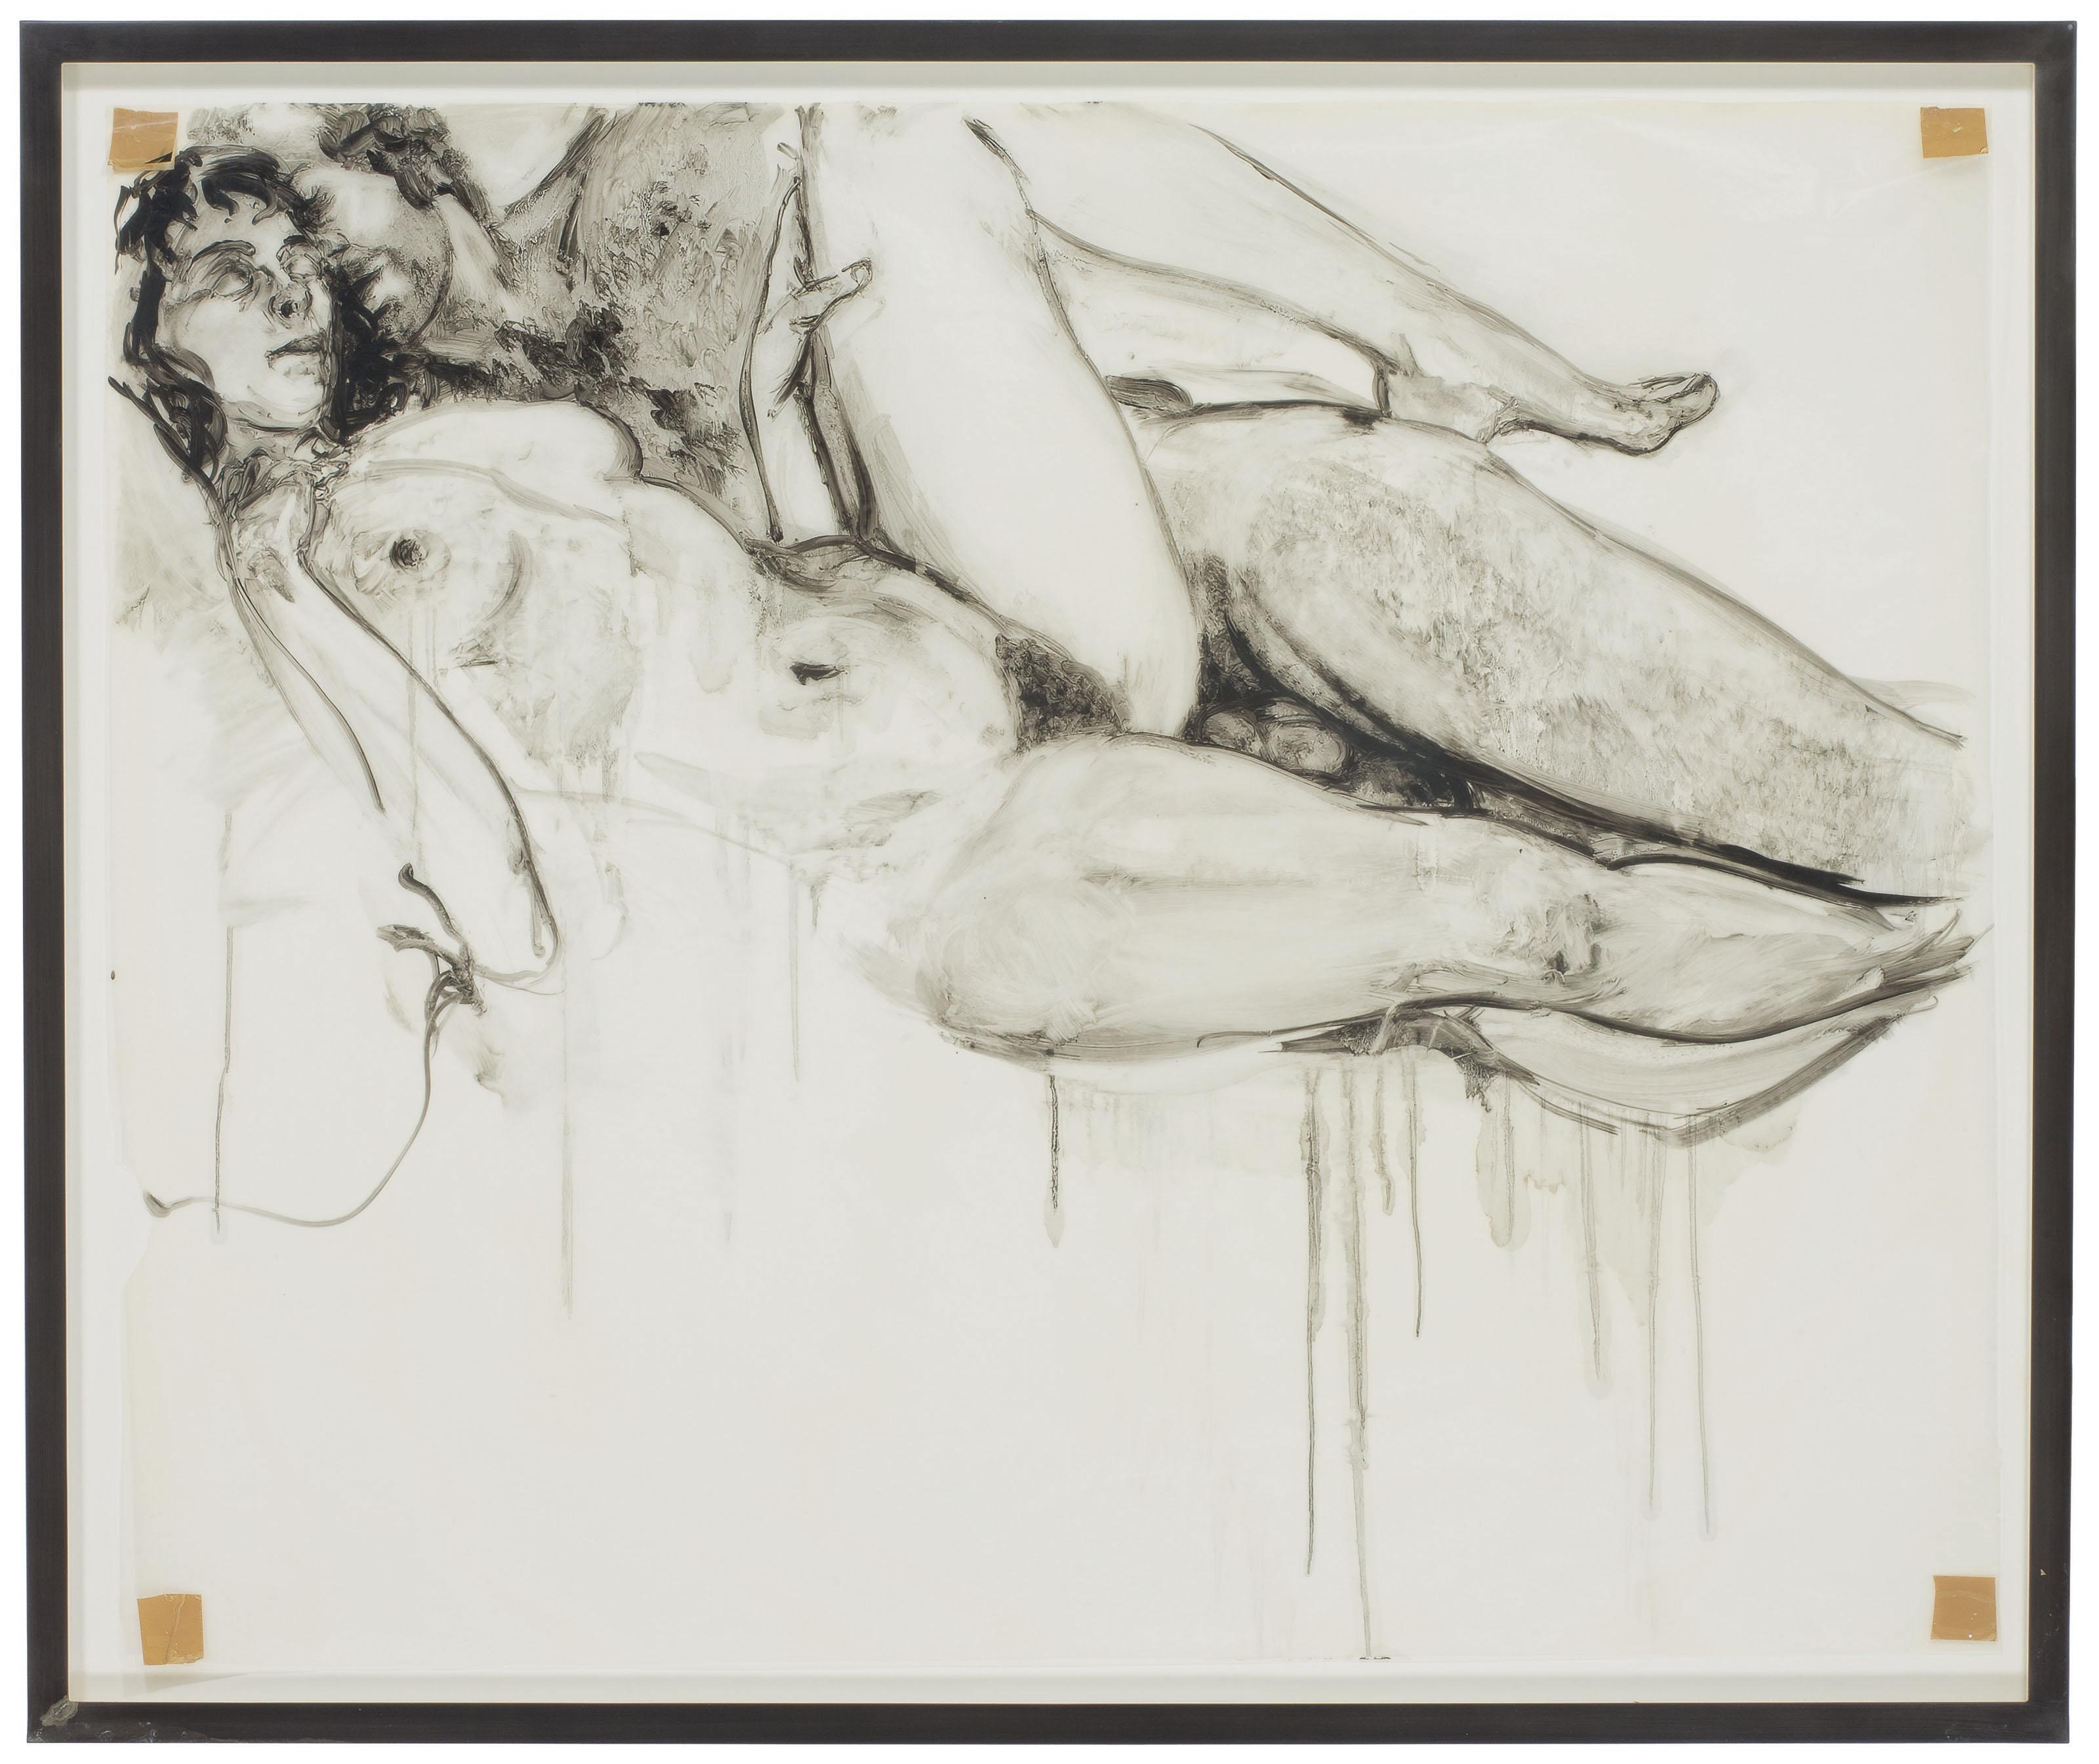 Eric Fischl (American, b. 1948